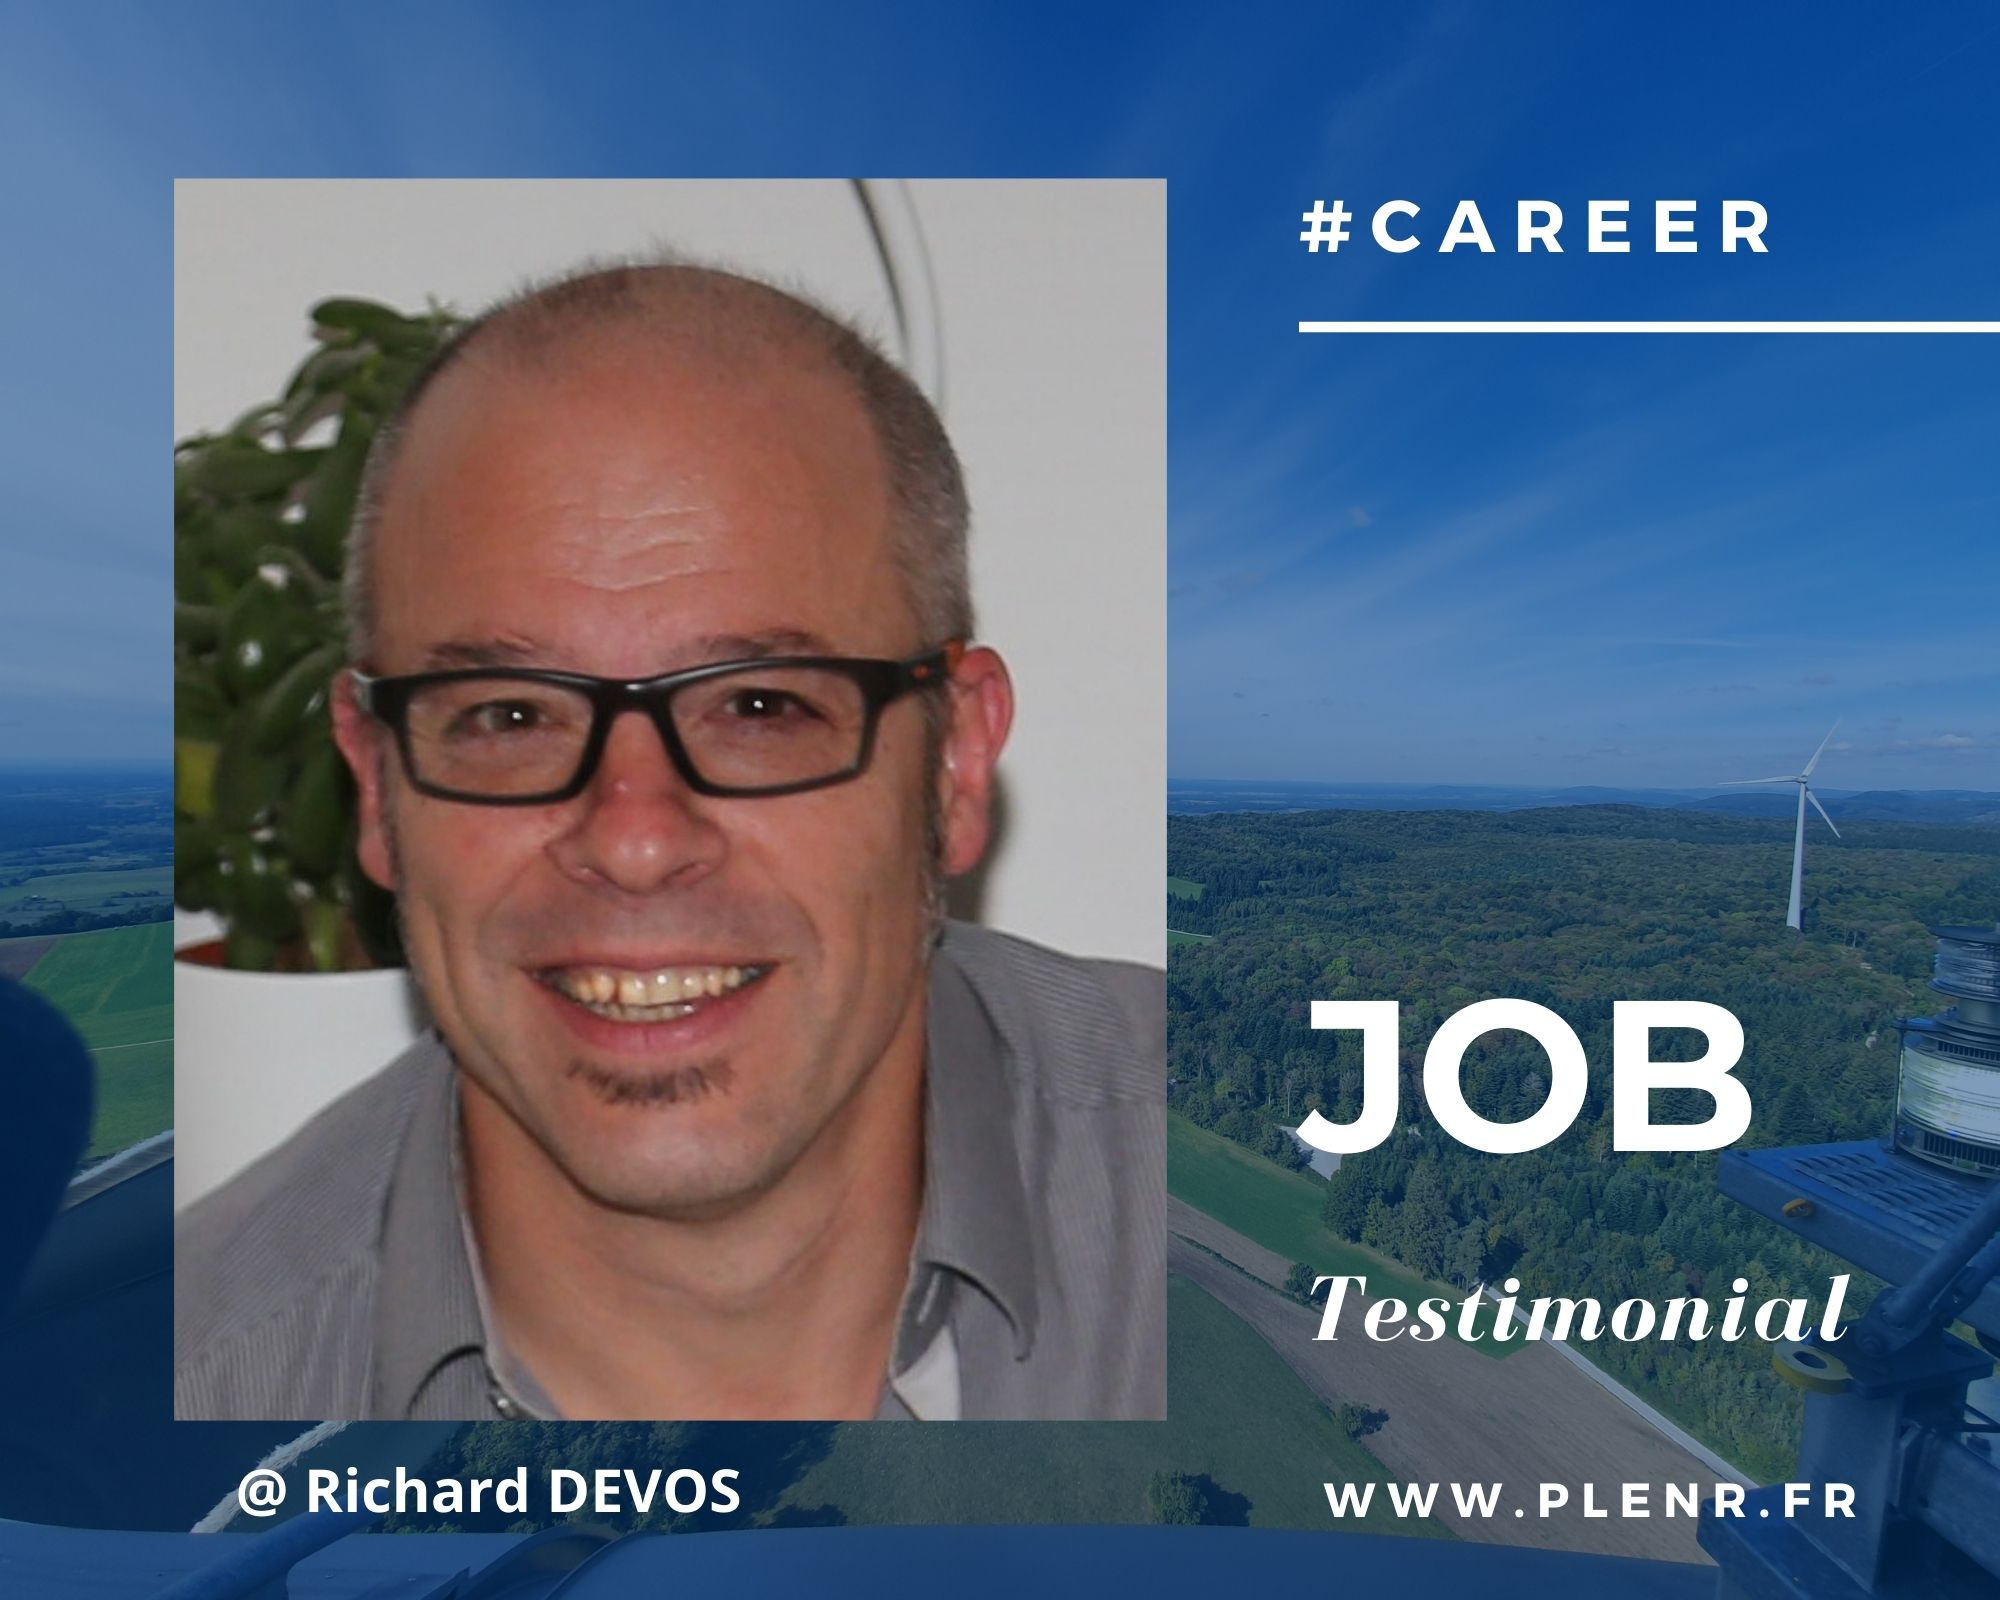 Job Testimonial - richard devos